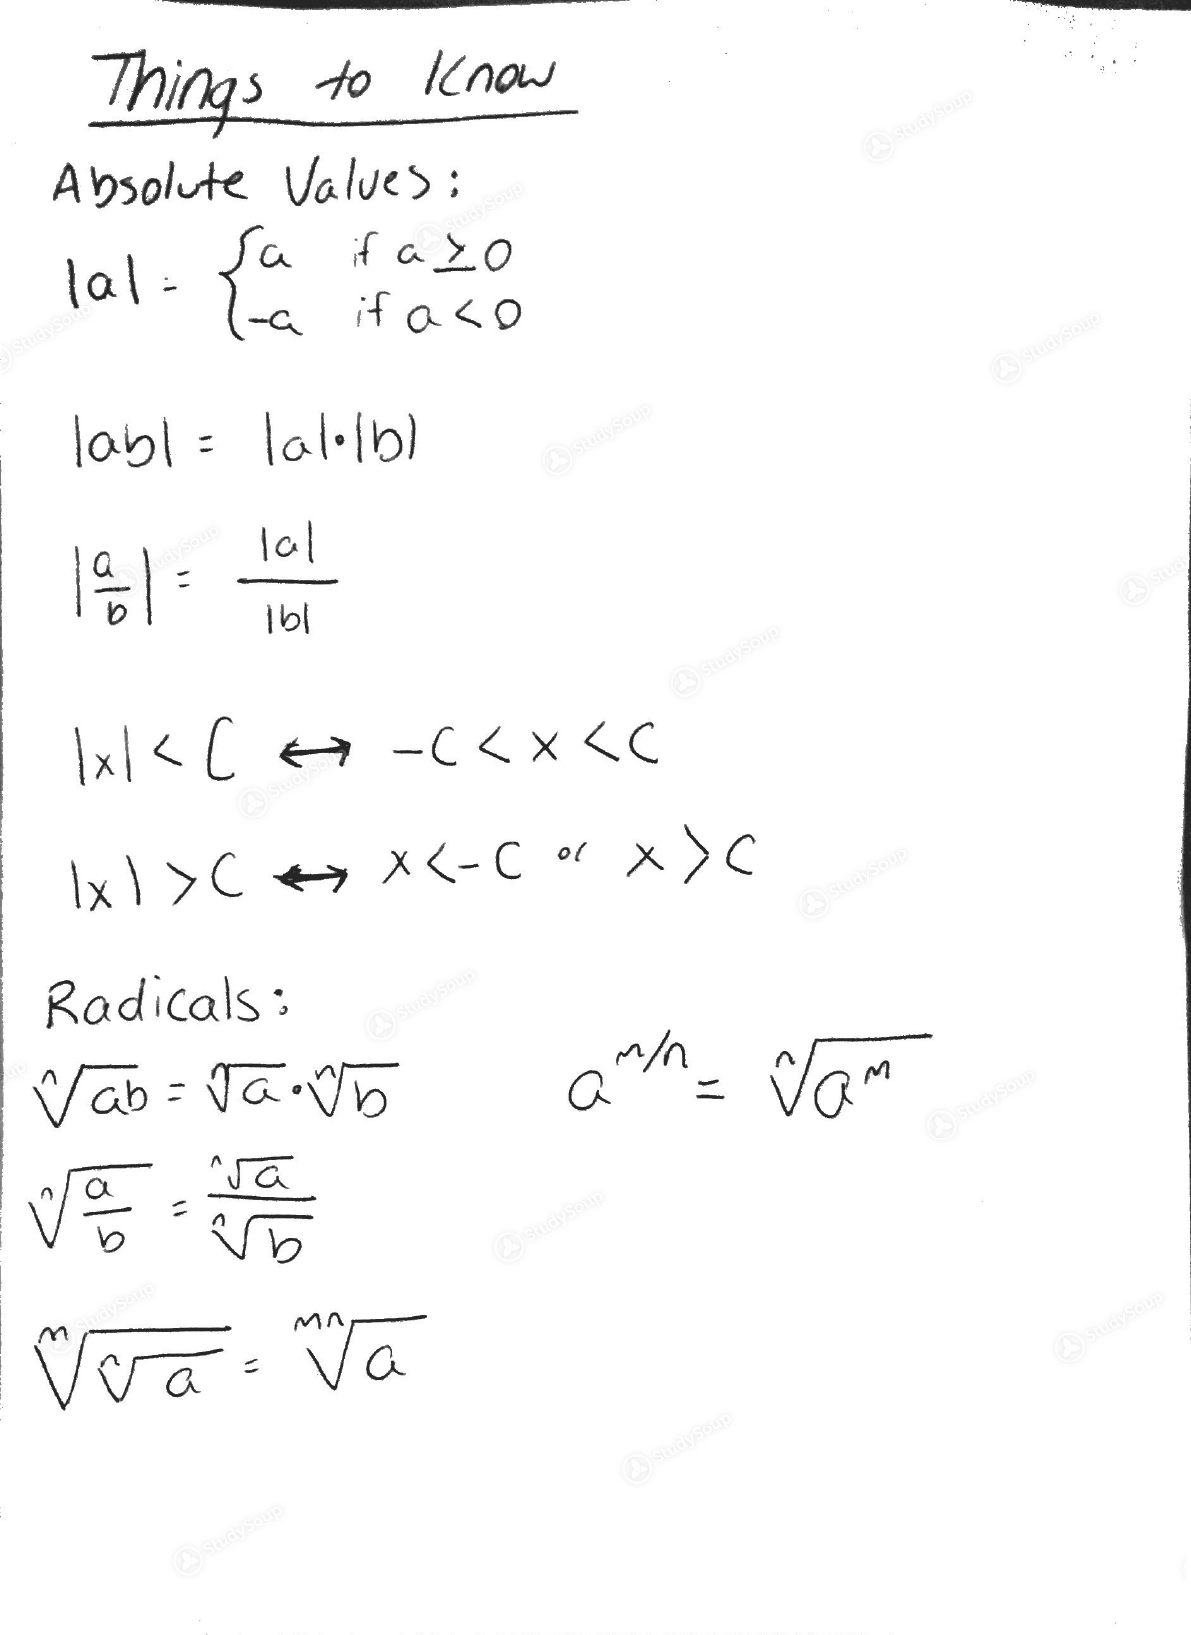 rutgers precalc college math 01640115 study guide midterm